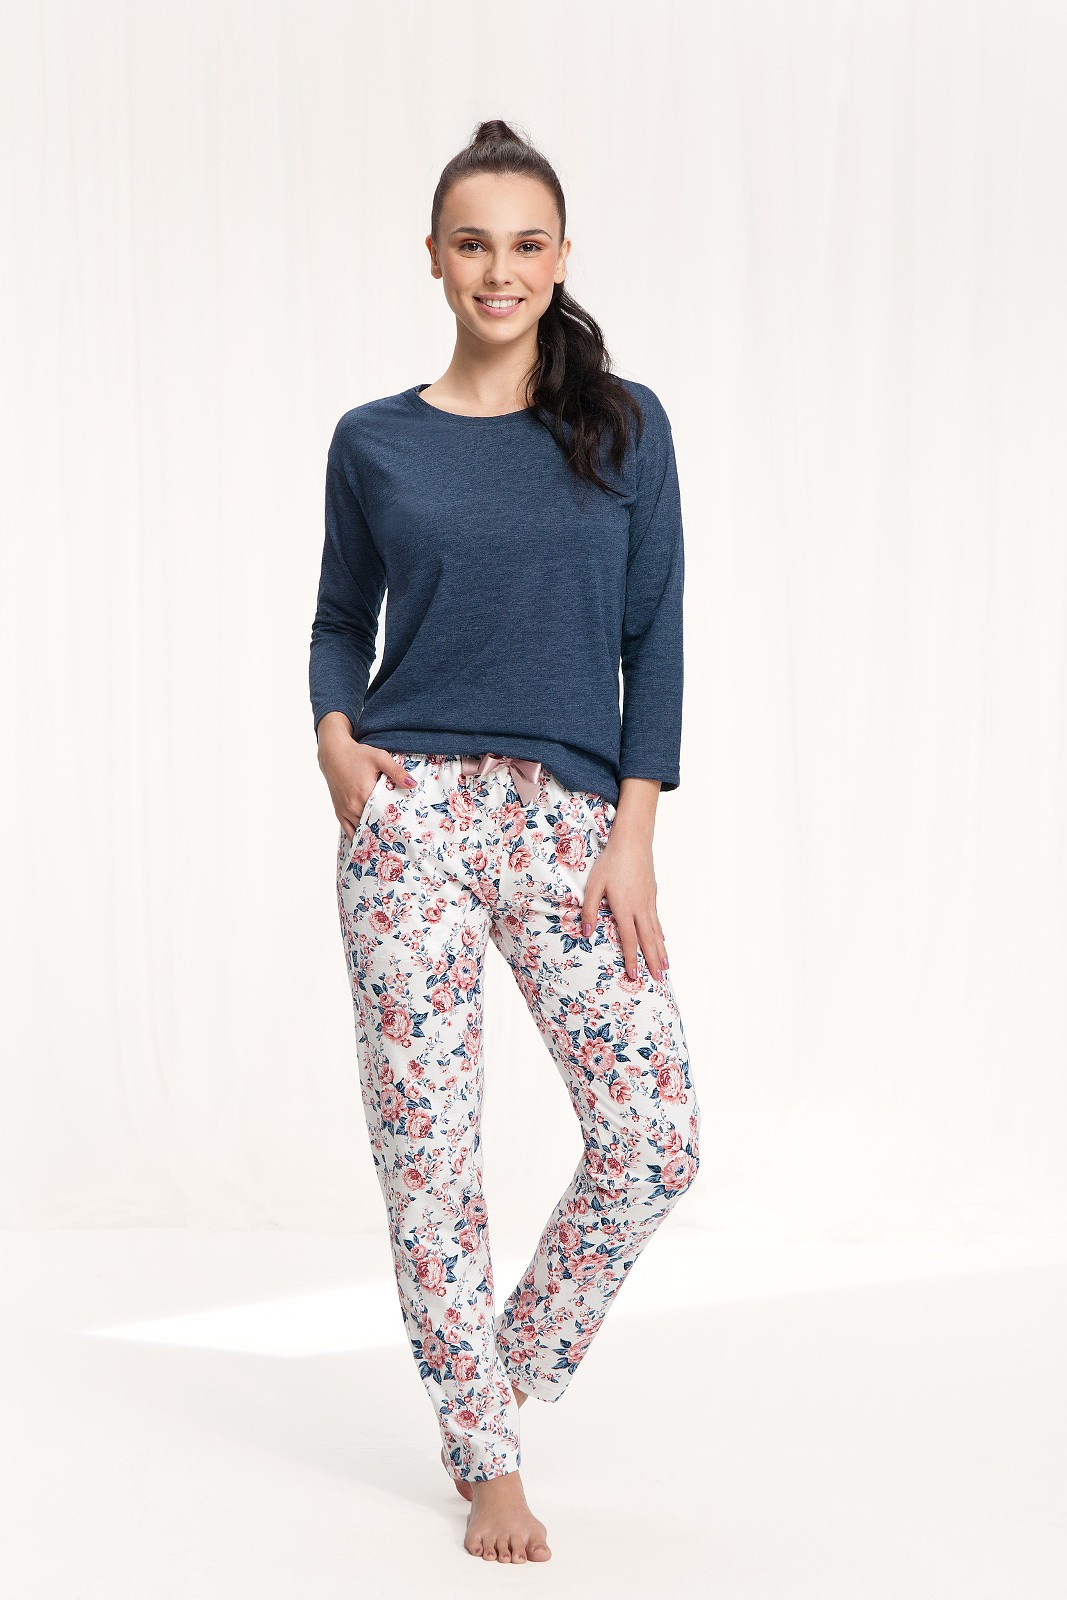 Dámske pyžamo Luna 645 w/r 3XL różany 3XL